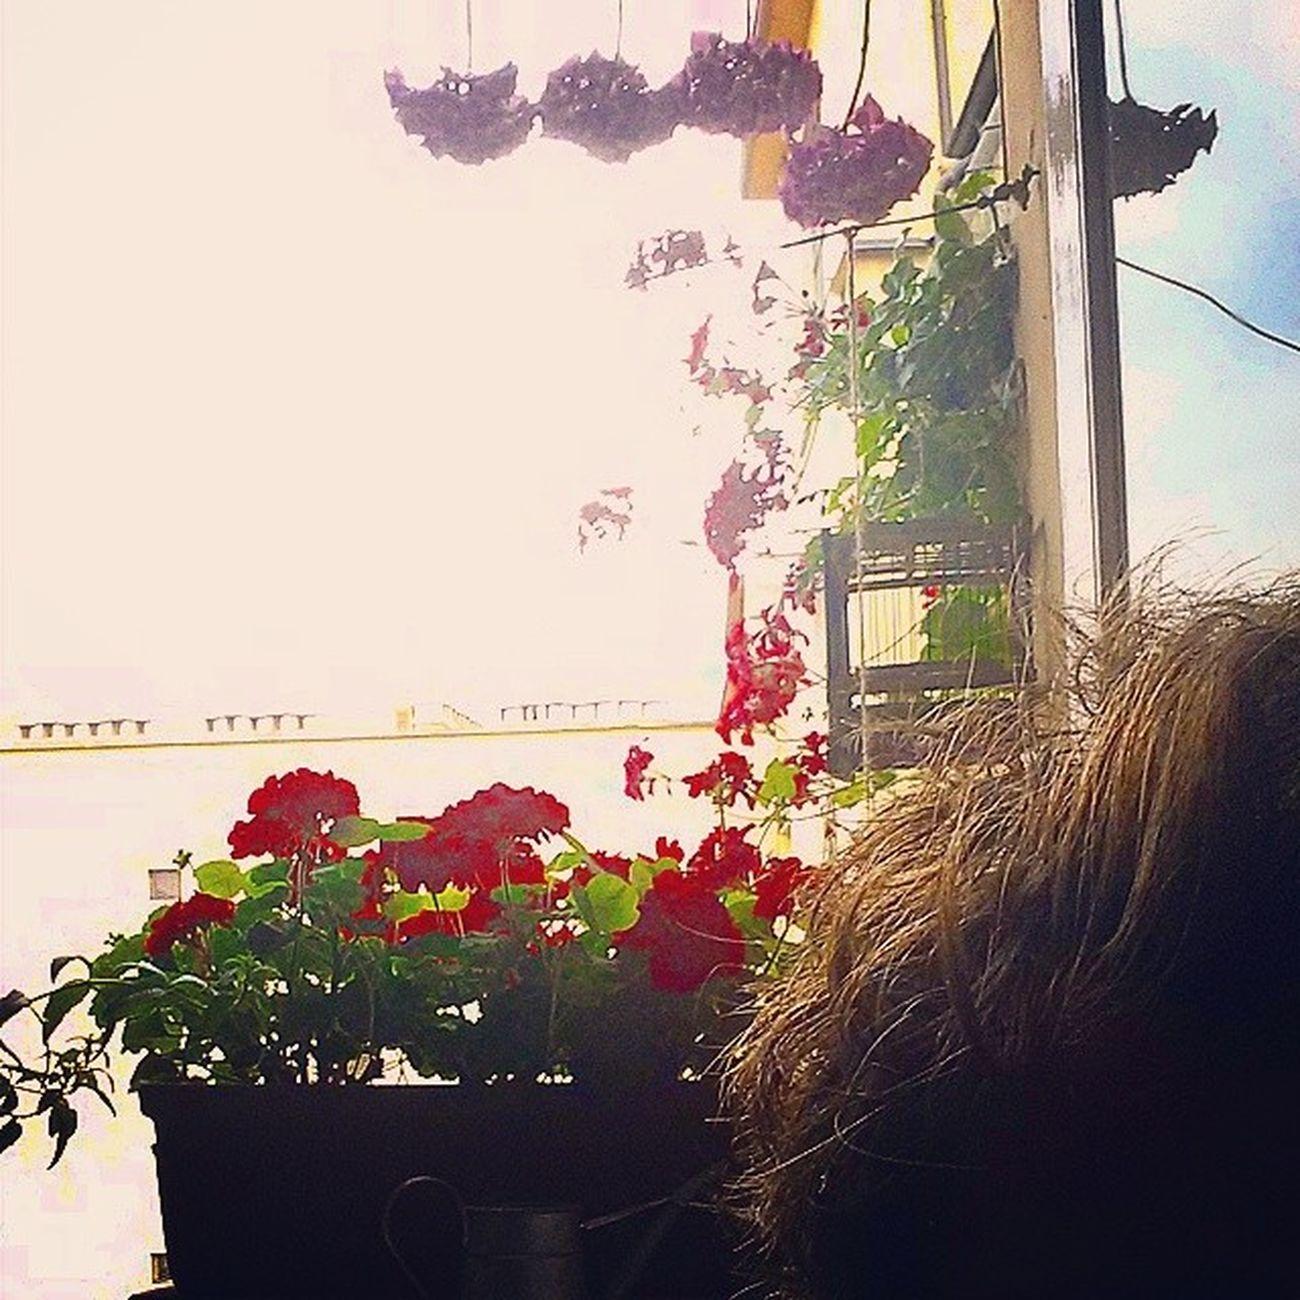 Adoro Aggiornamento Saturation Flower jadore treschic tresor InstaTO instatop luxury light windows widow instalife like4like picoftheday legendarylover katy prism rainbow sky home followback